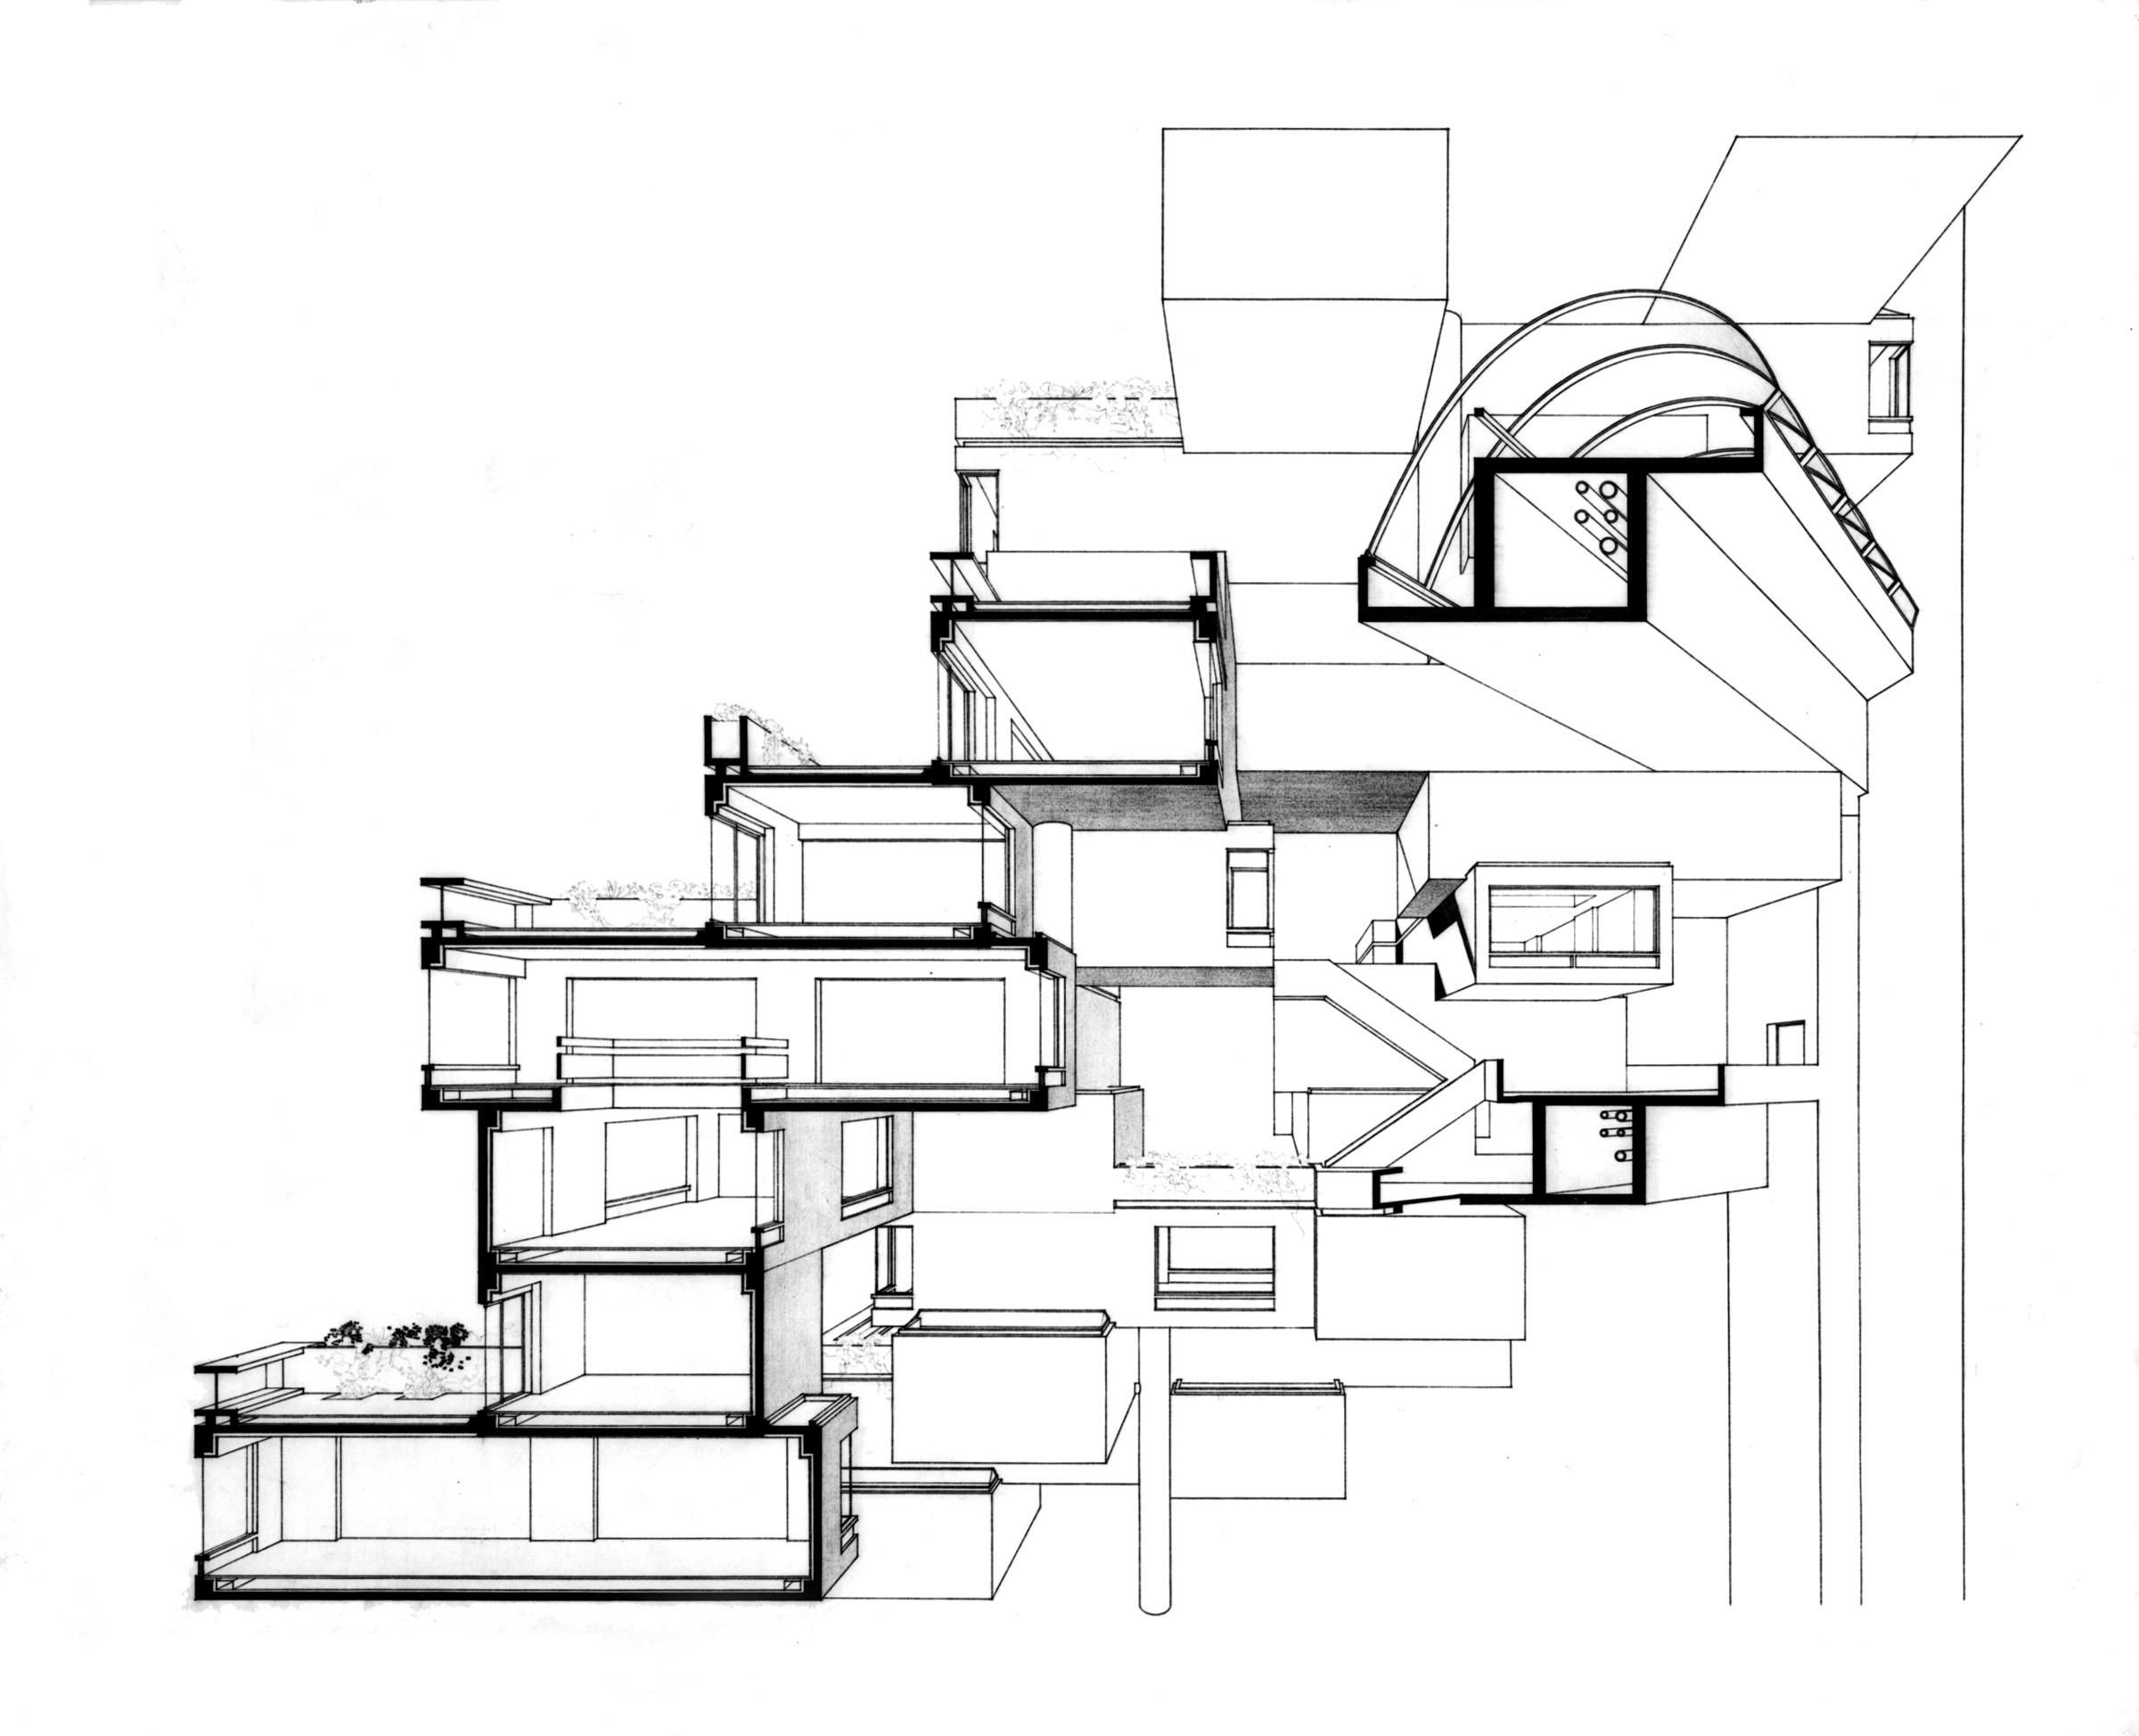 Looking Back Concrete Modular Prefab Habitat 67